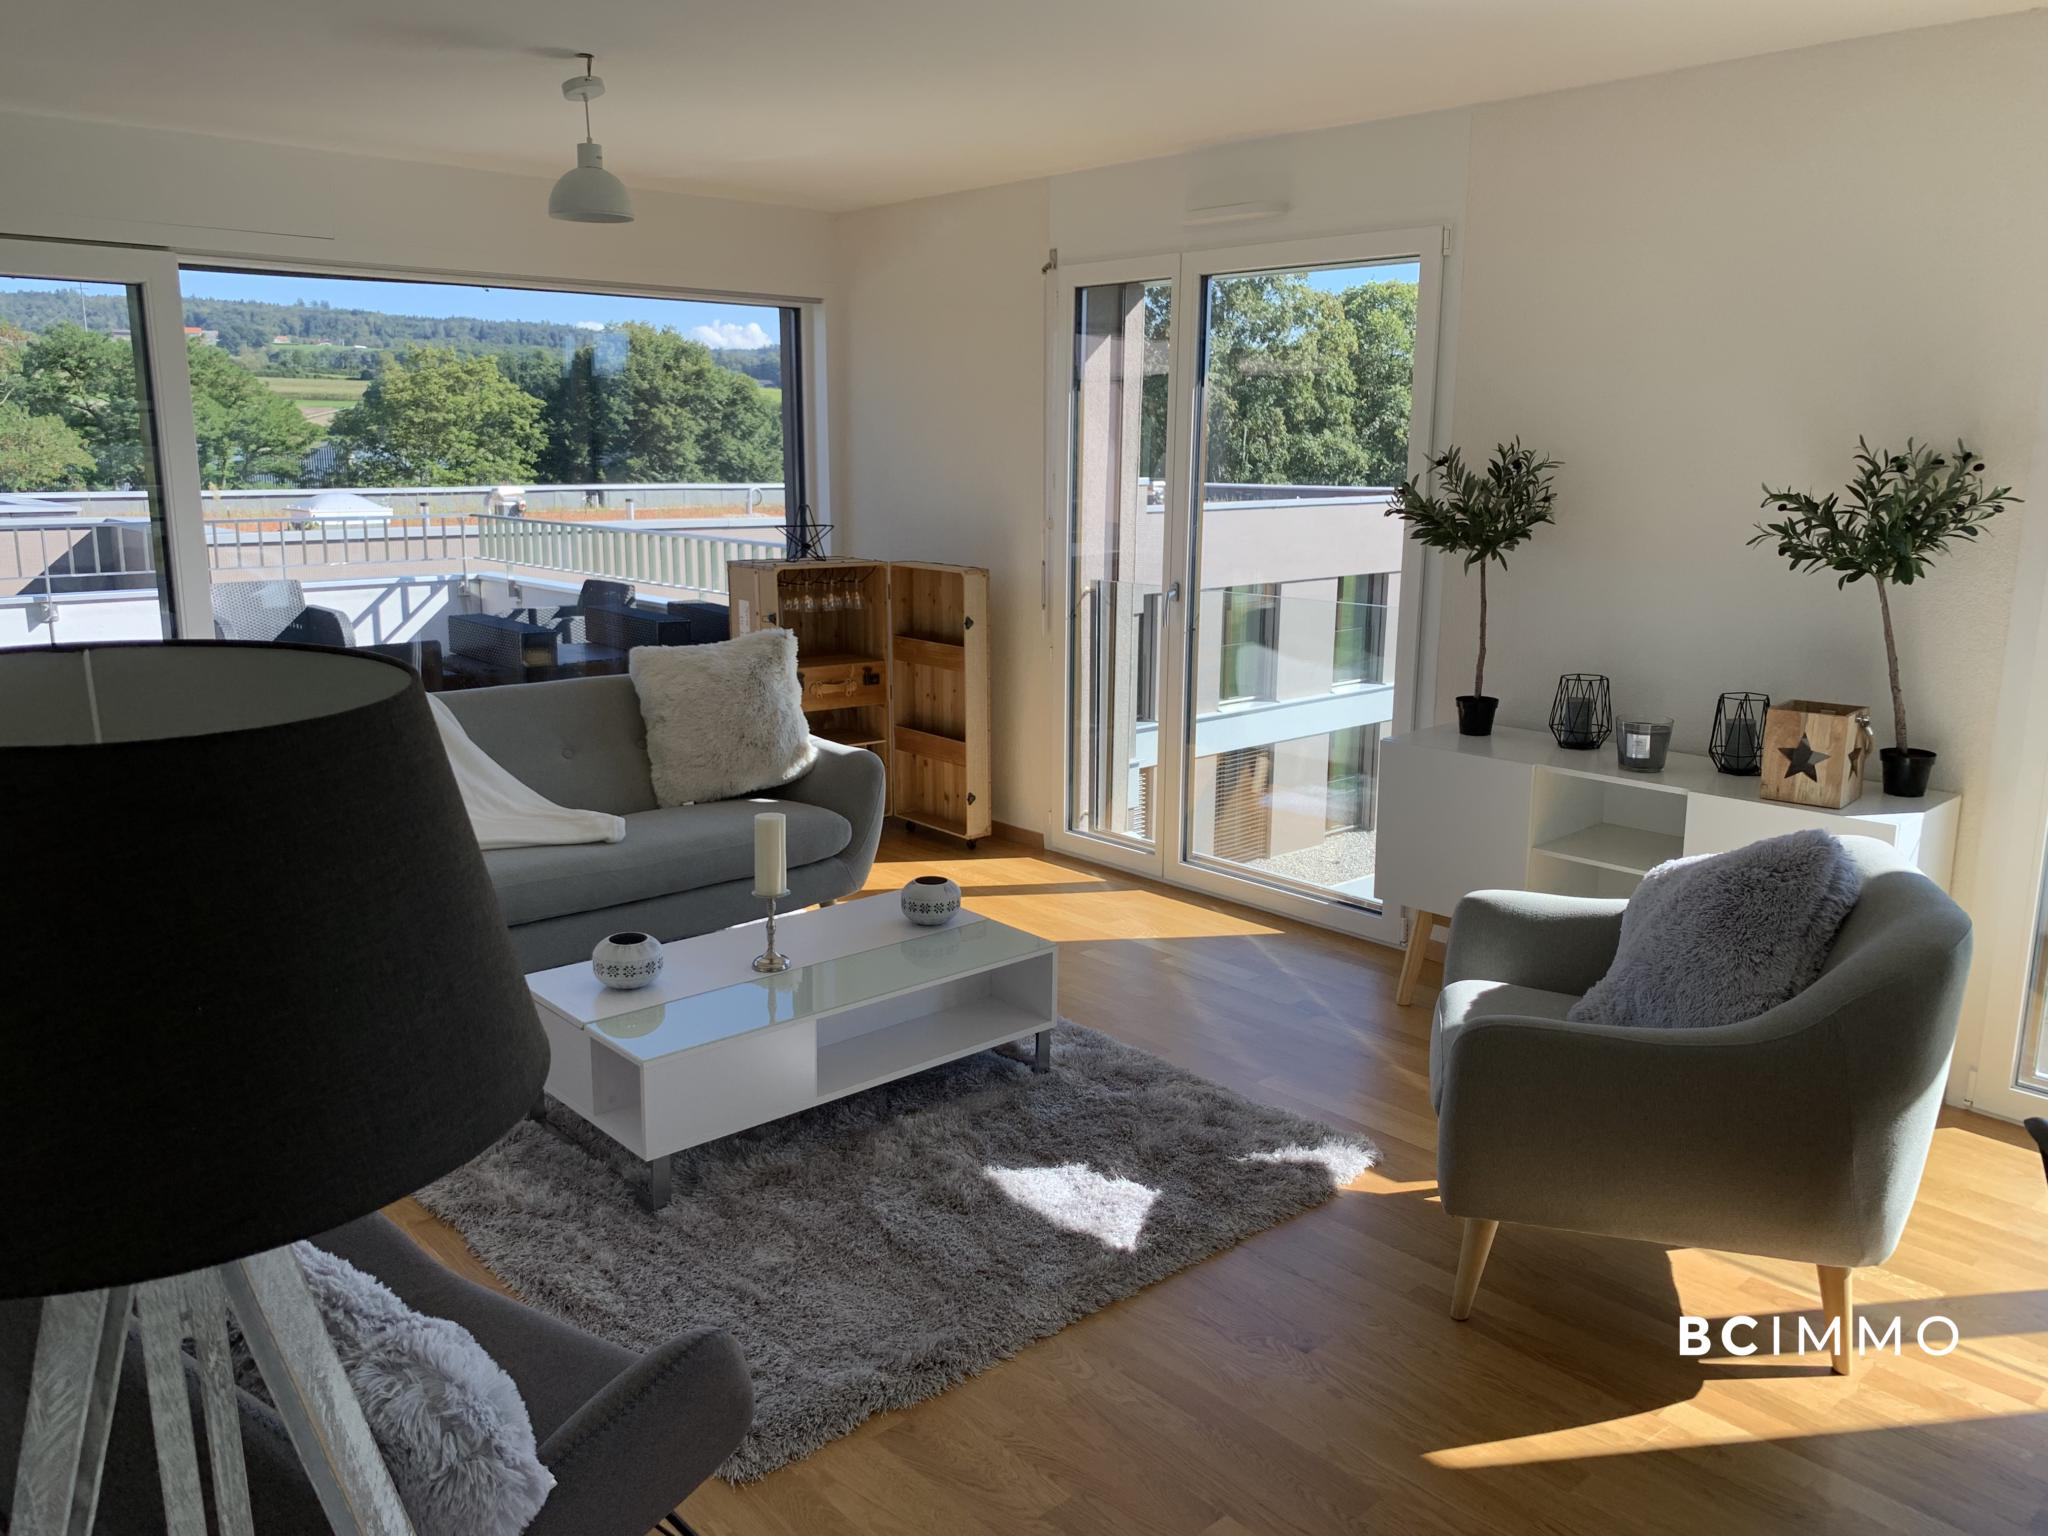 BC Immo - Appartement neuf en attique - C5-07